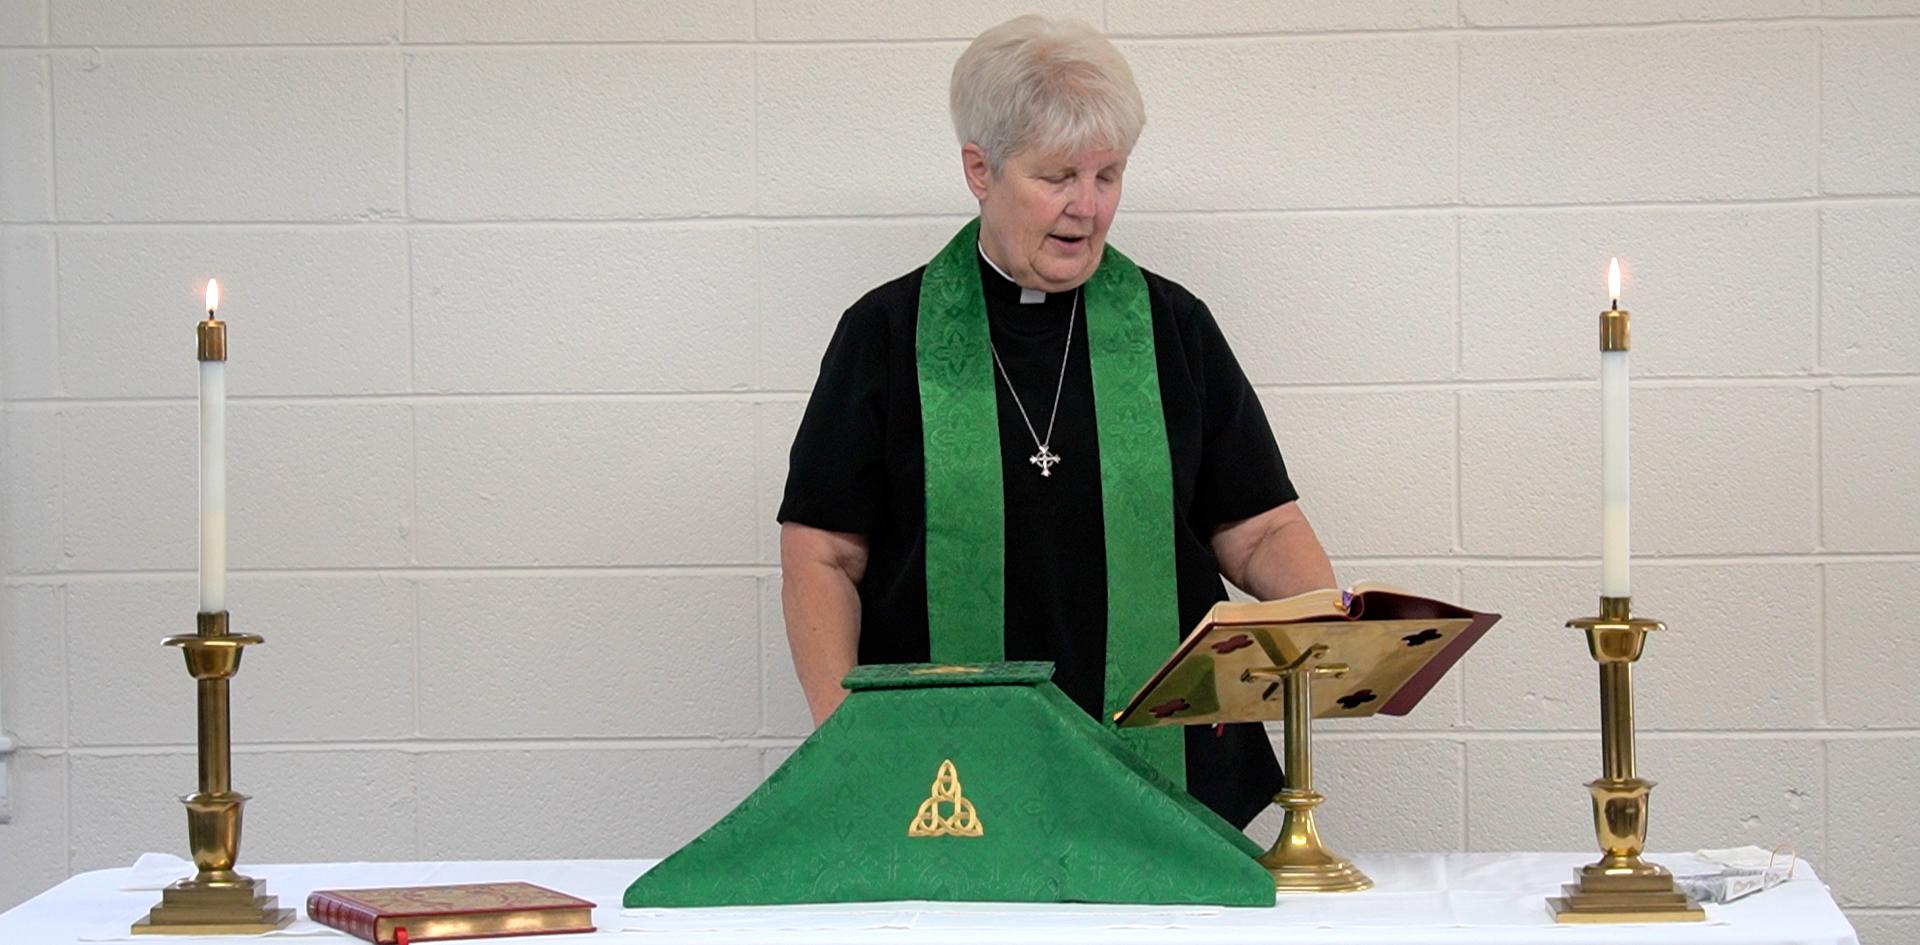 Vicar Cindy